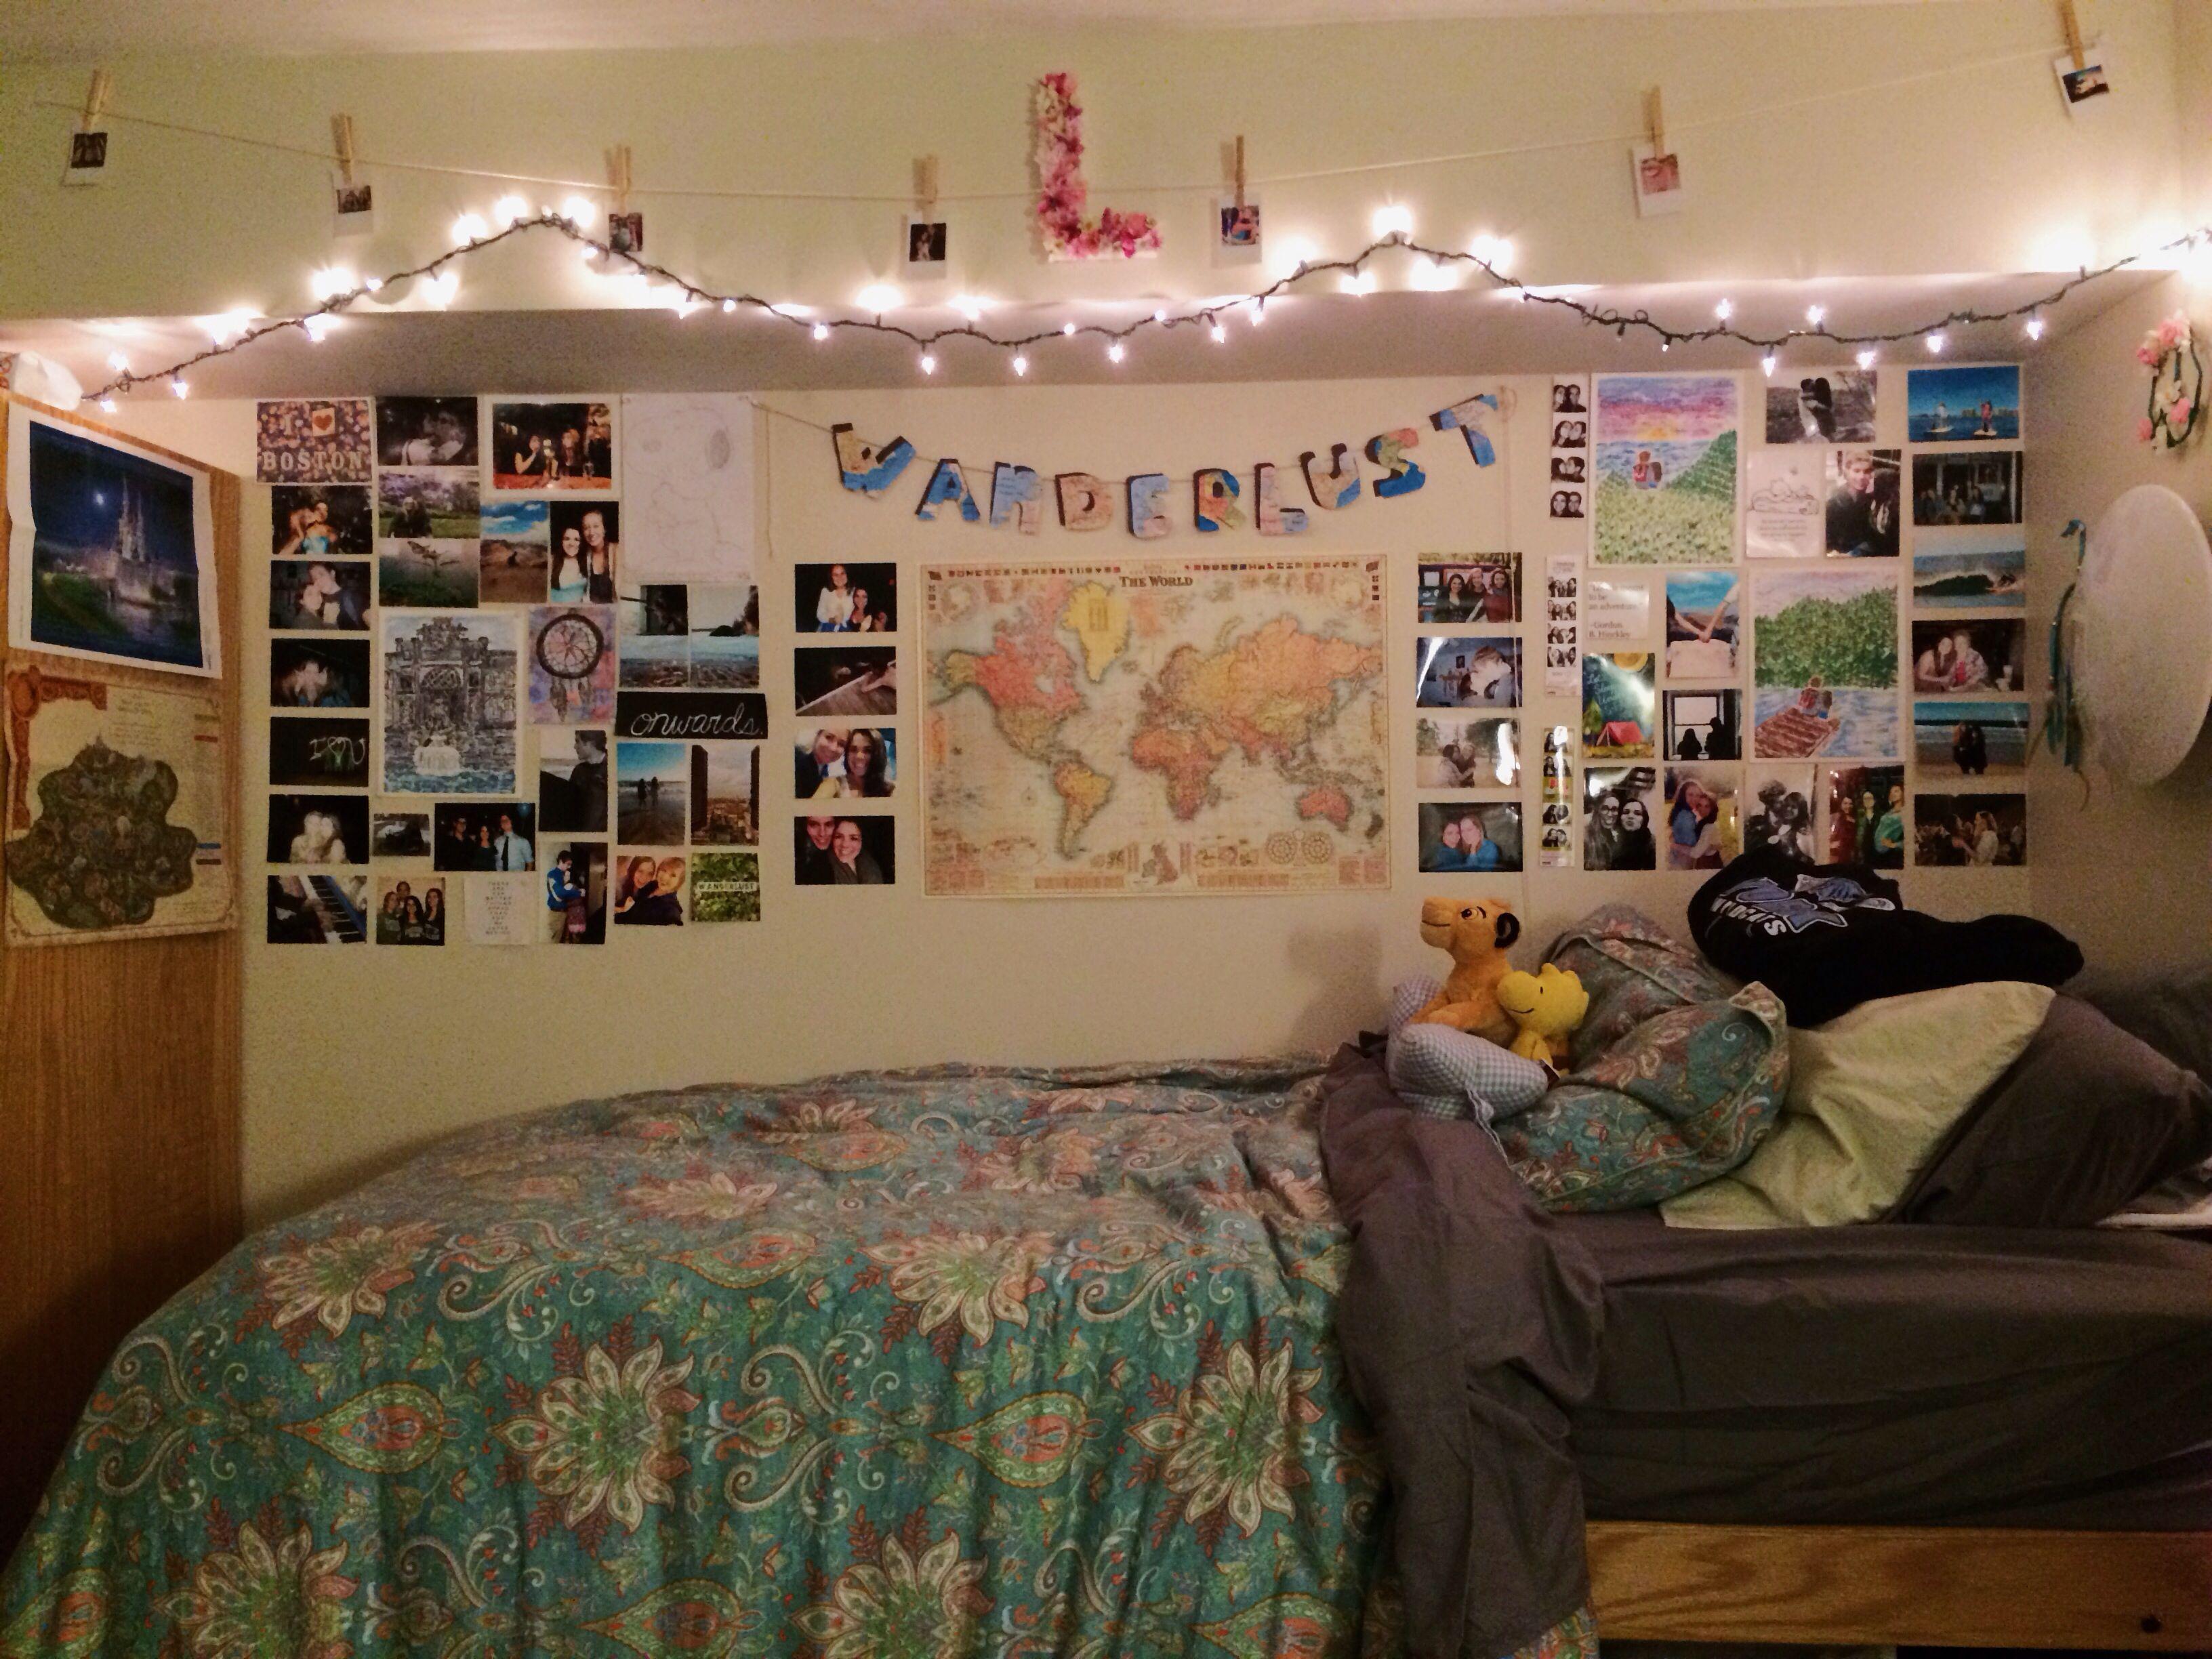 College dorm emerson college dorm decor pinterest for College apartment rooms